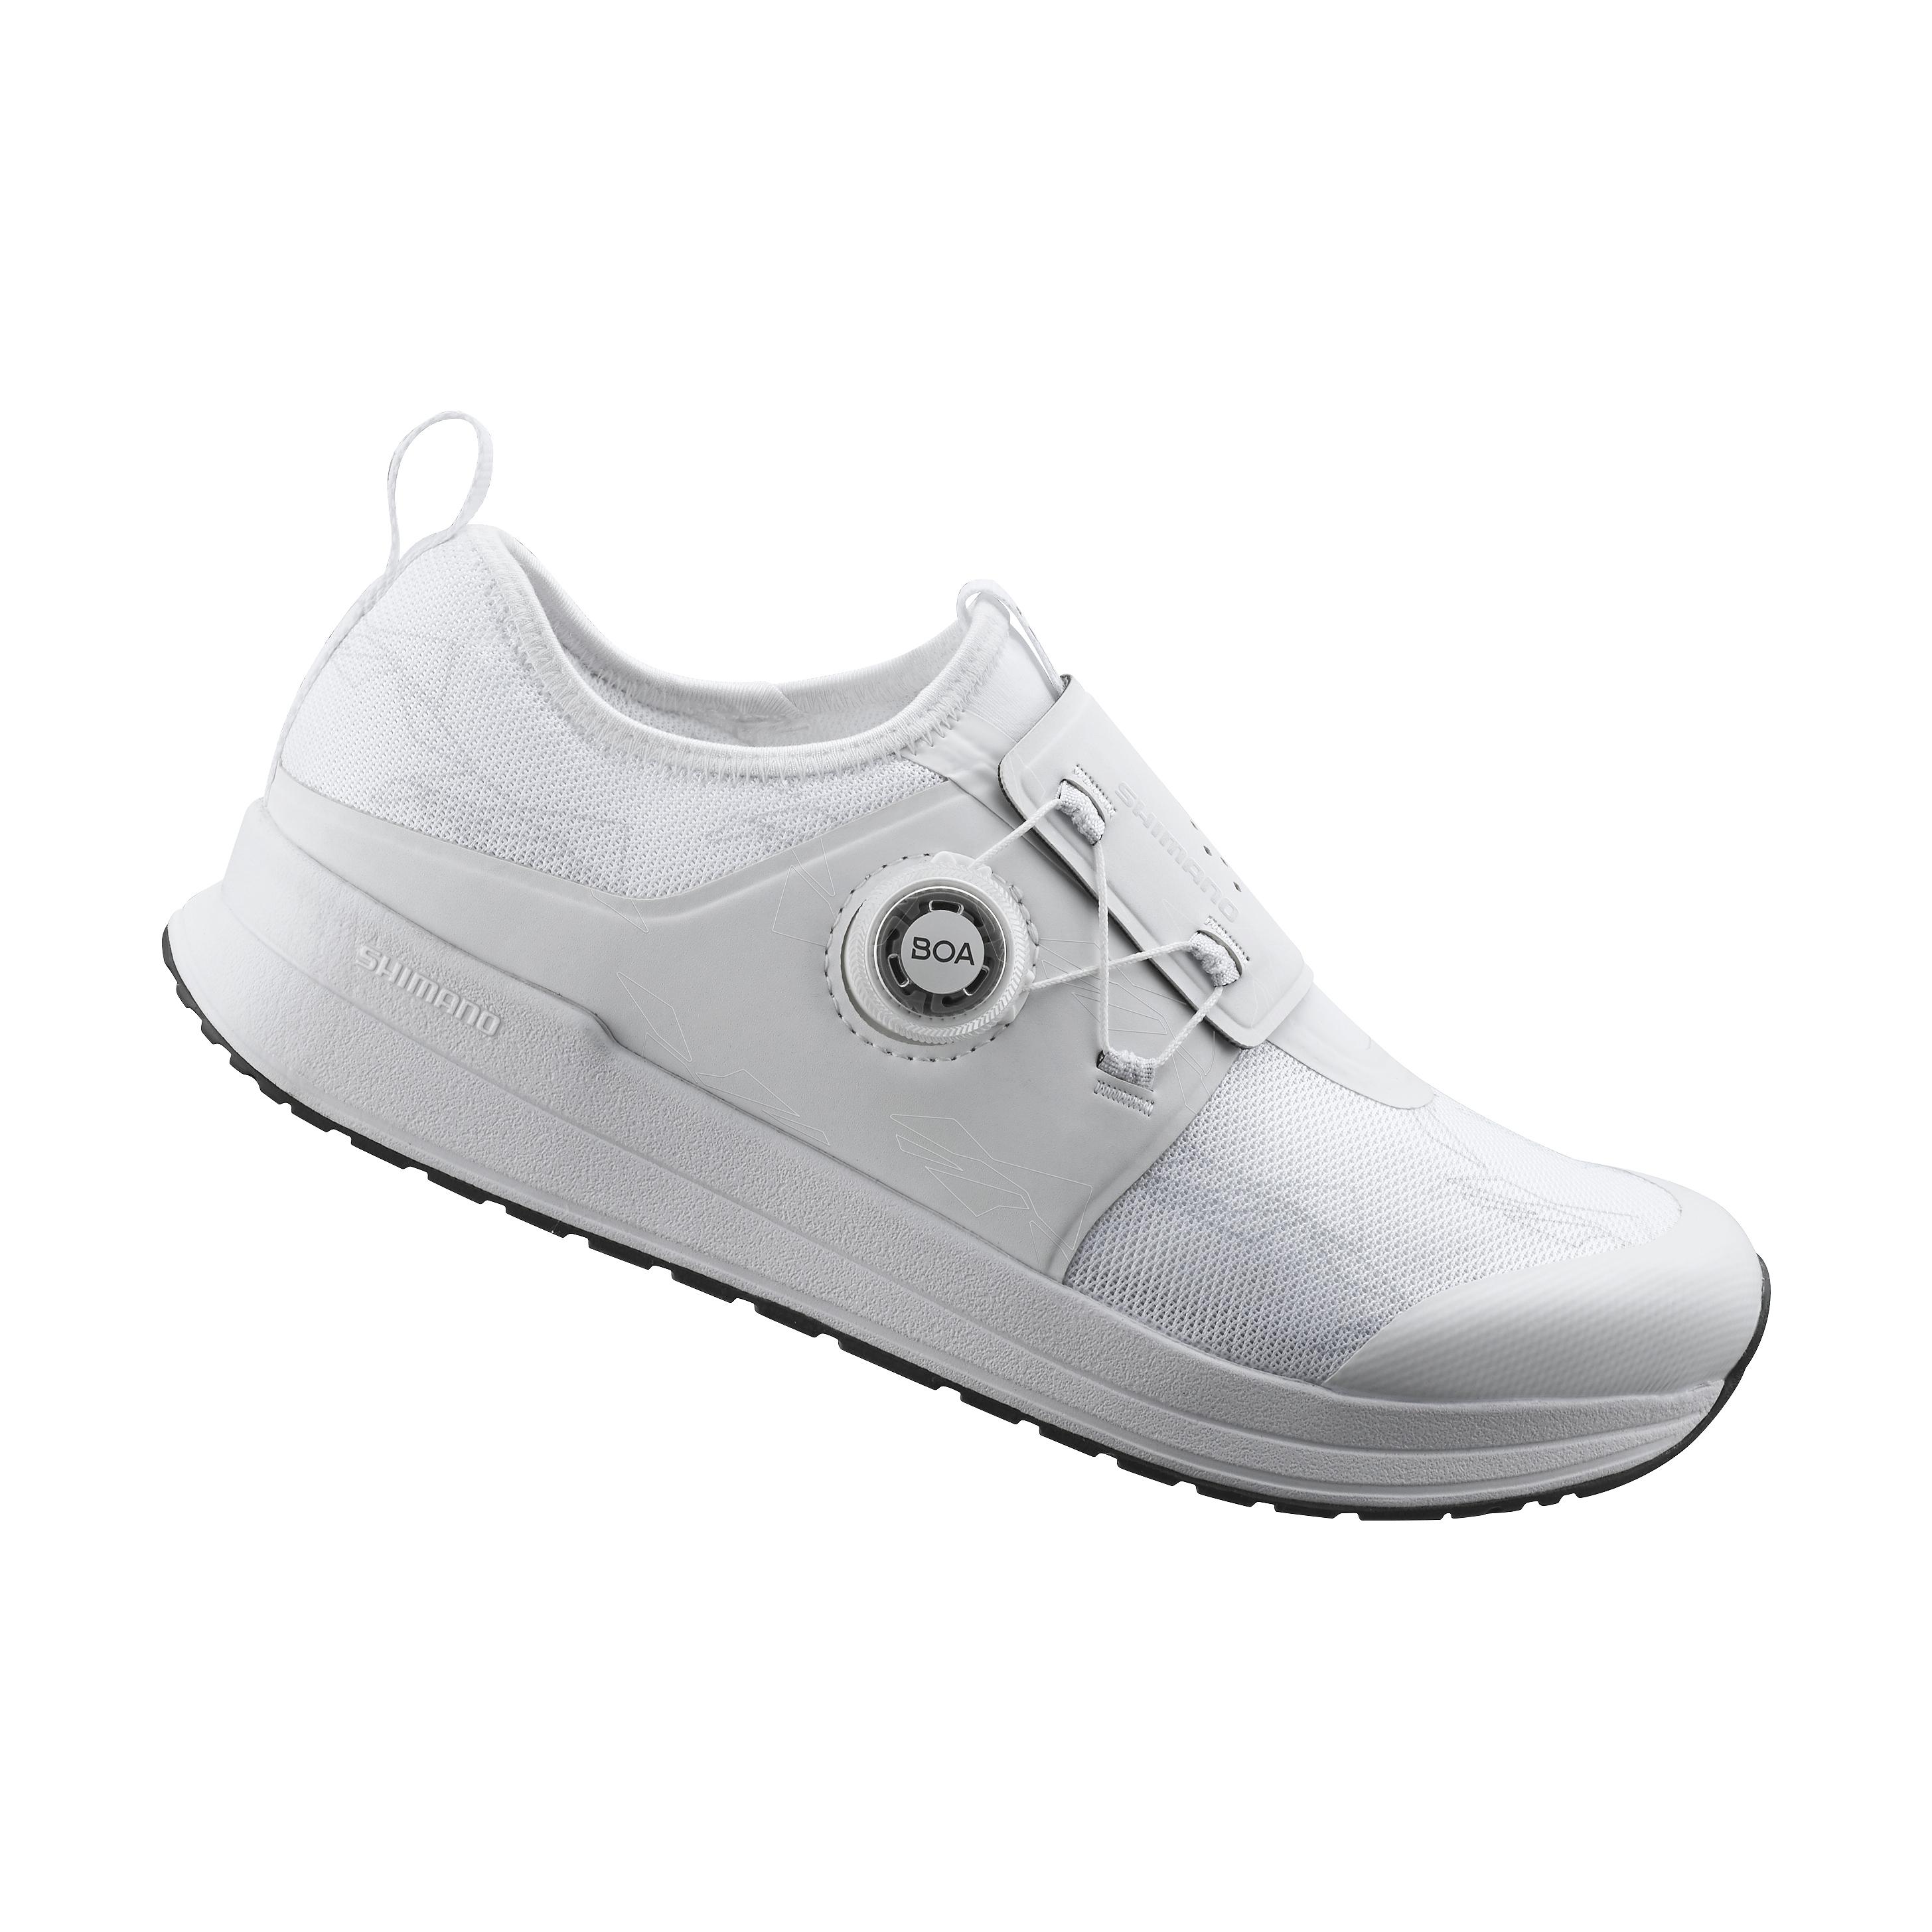 SHIMANO INDOOR obuv SH-IC300, bílá, Velikost: 38